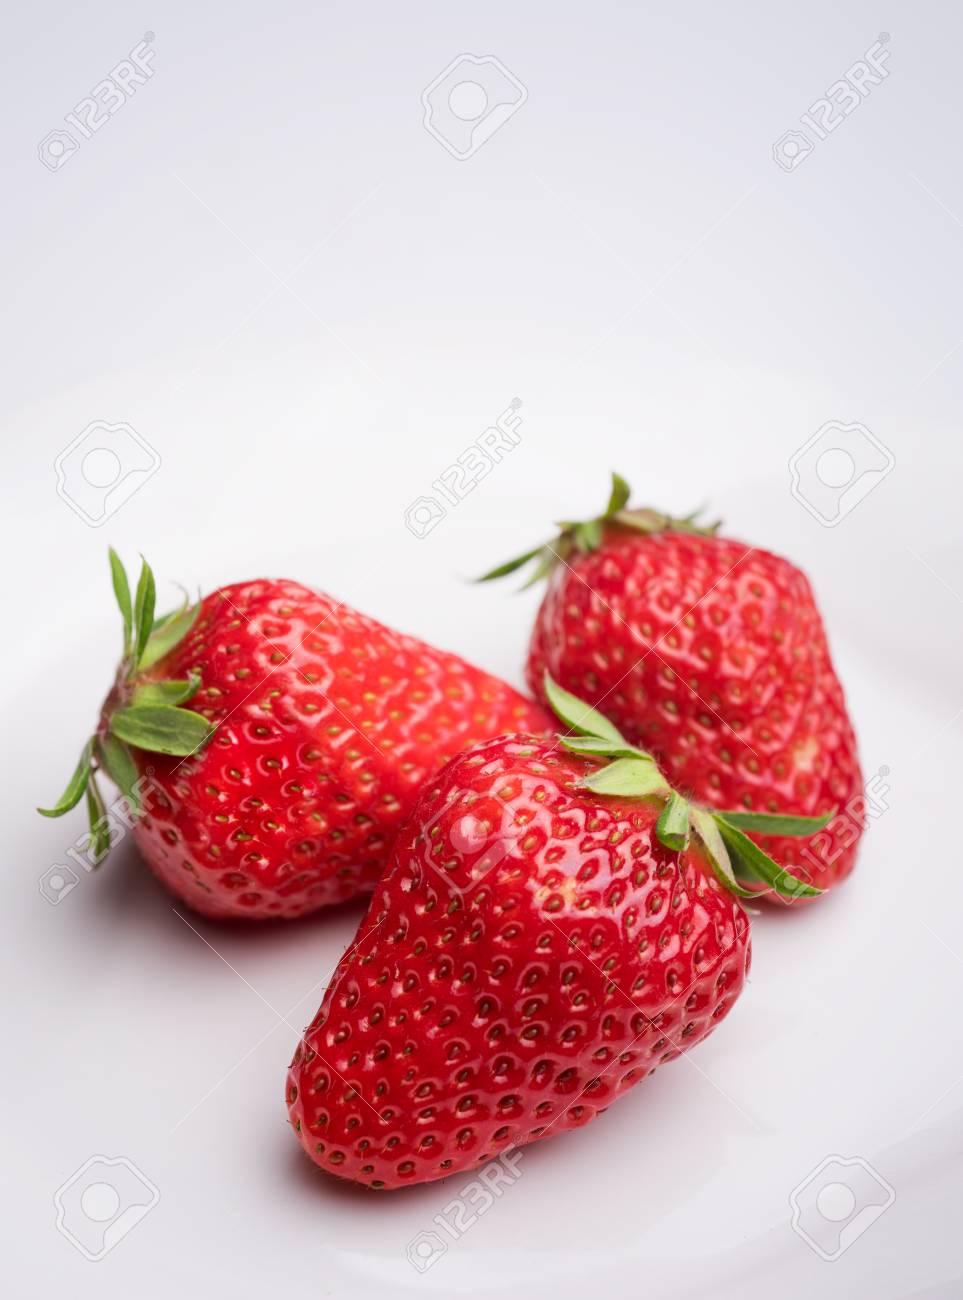 Strawberries on white background - 115523387